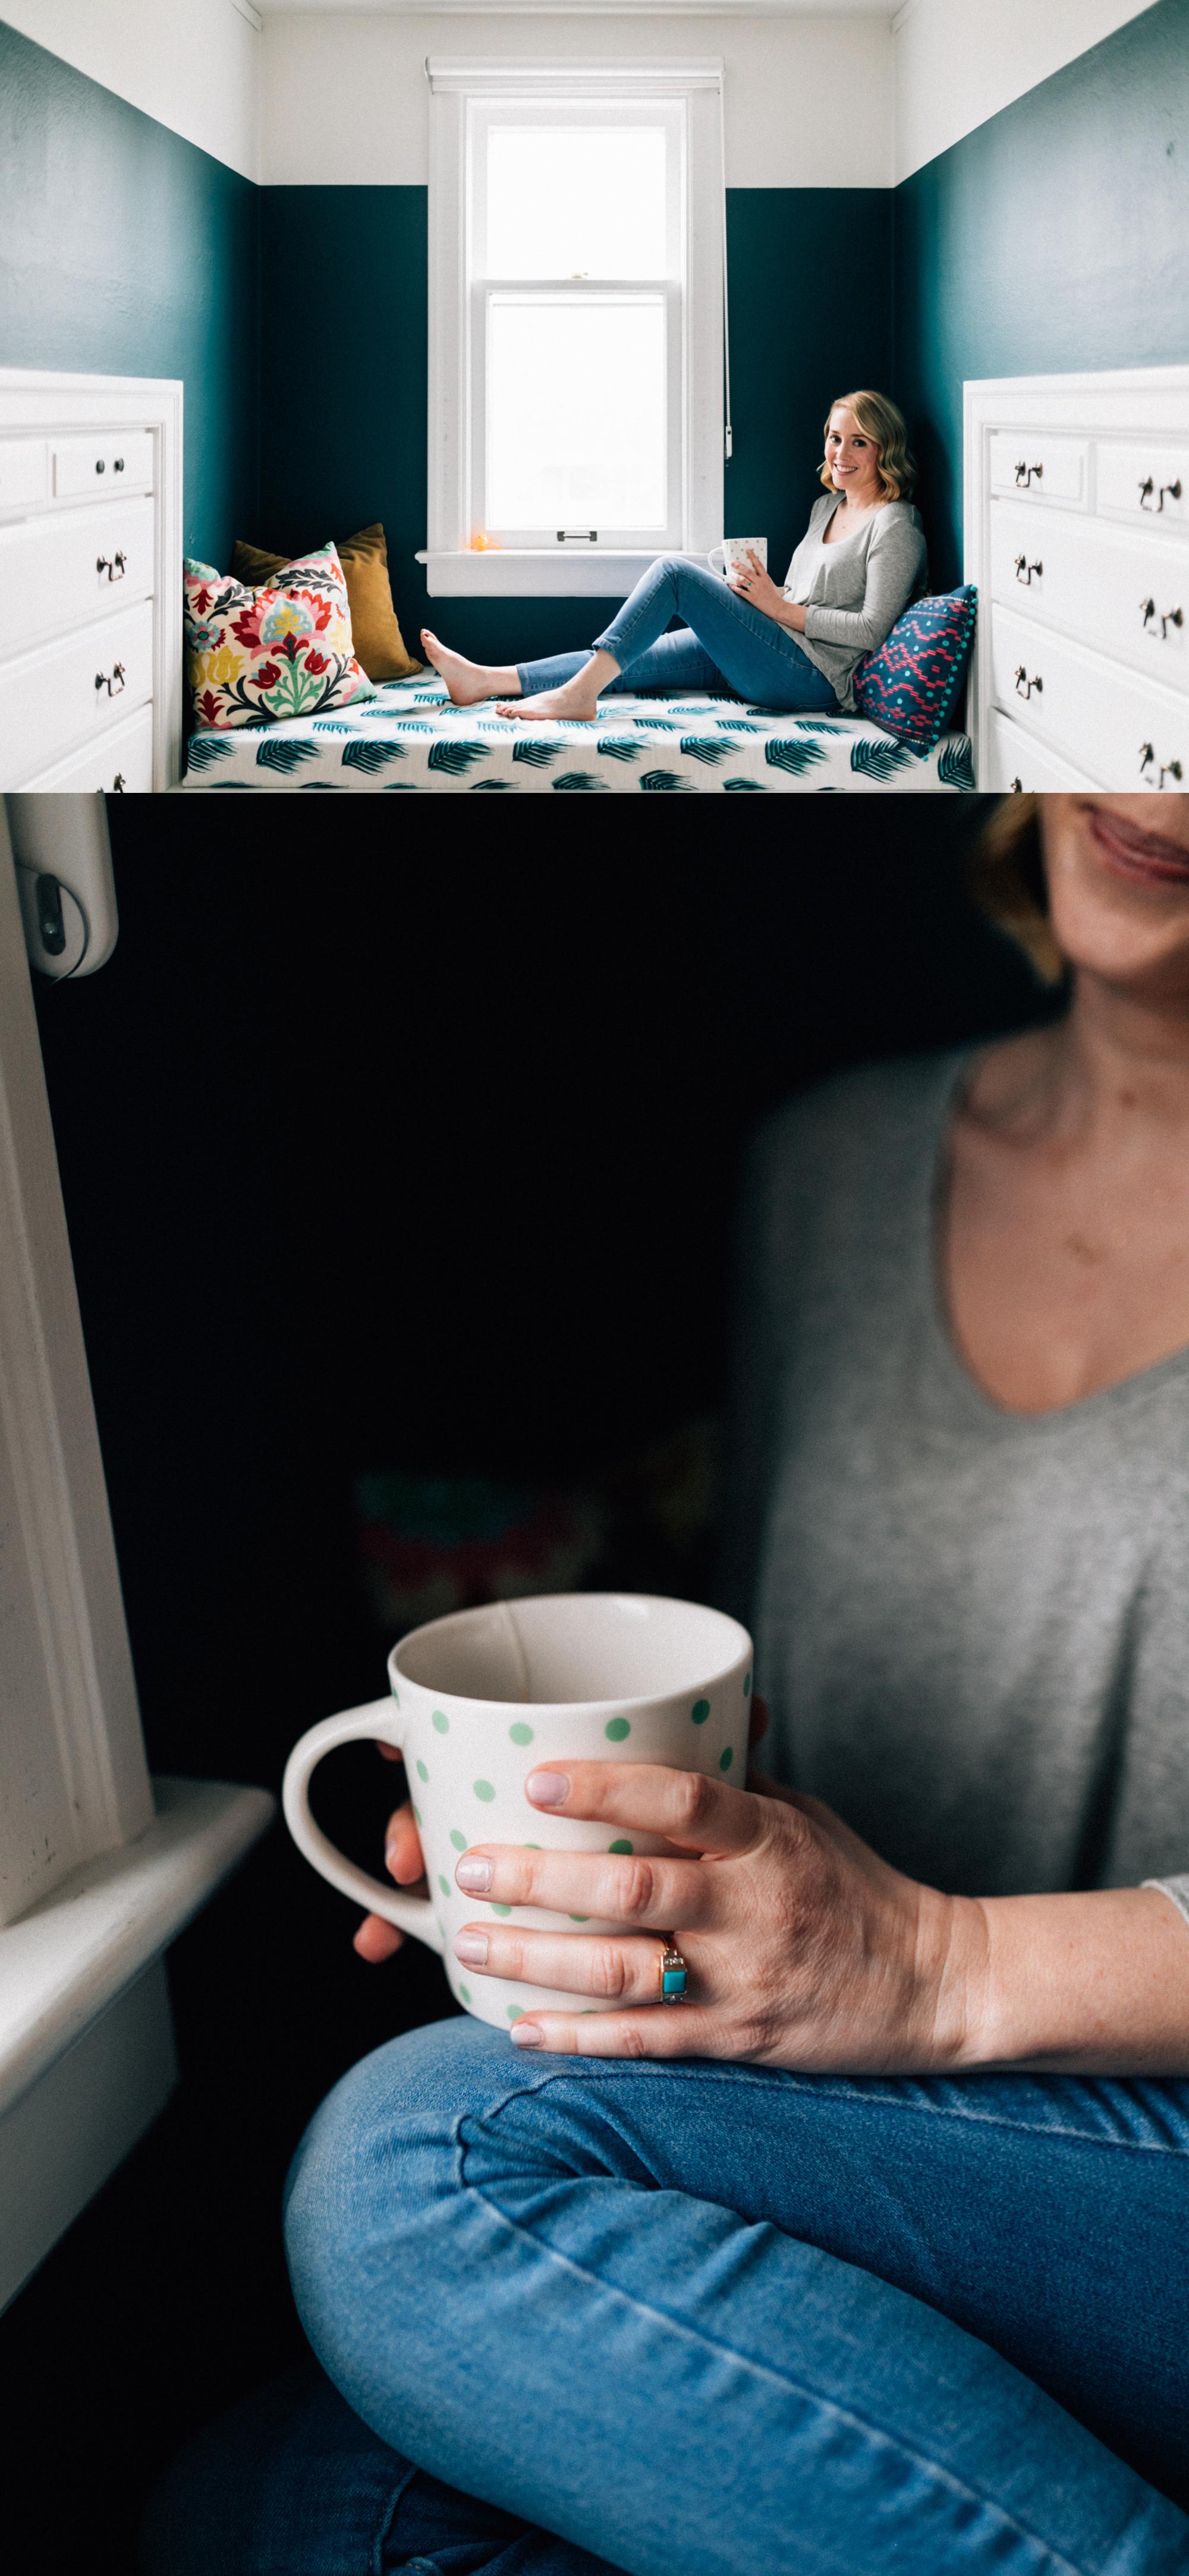 seattle in home engagement lifestyle couples photos wedding photographer washington pnw-16.jpg